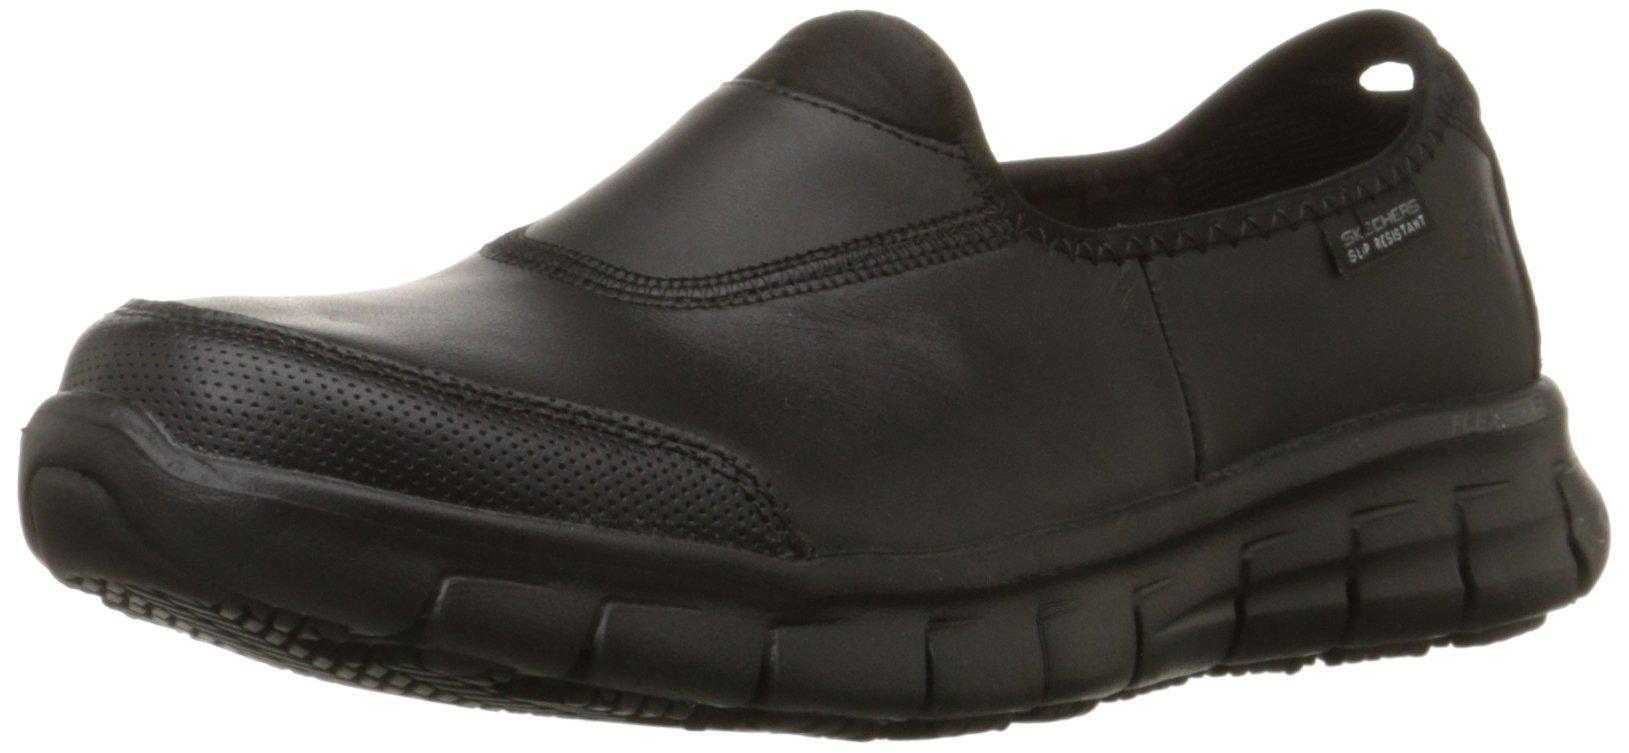 Skechers for Work Women's Sure Track Slip Resistant Shoe, Black, 8.5 M US by Skechers